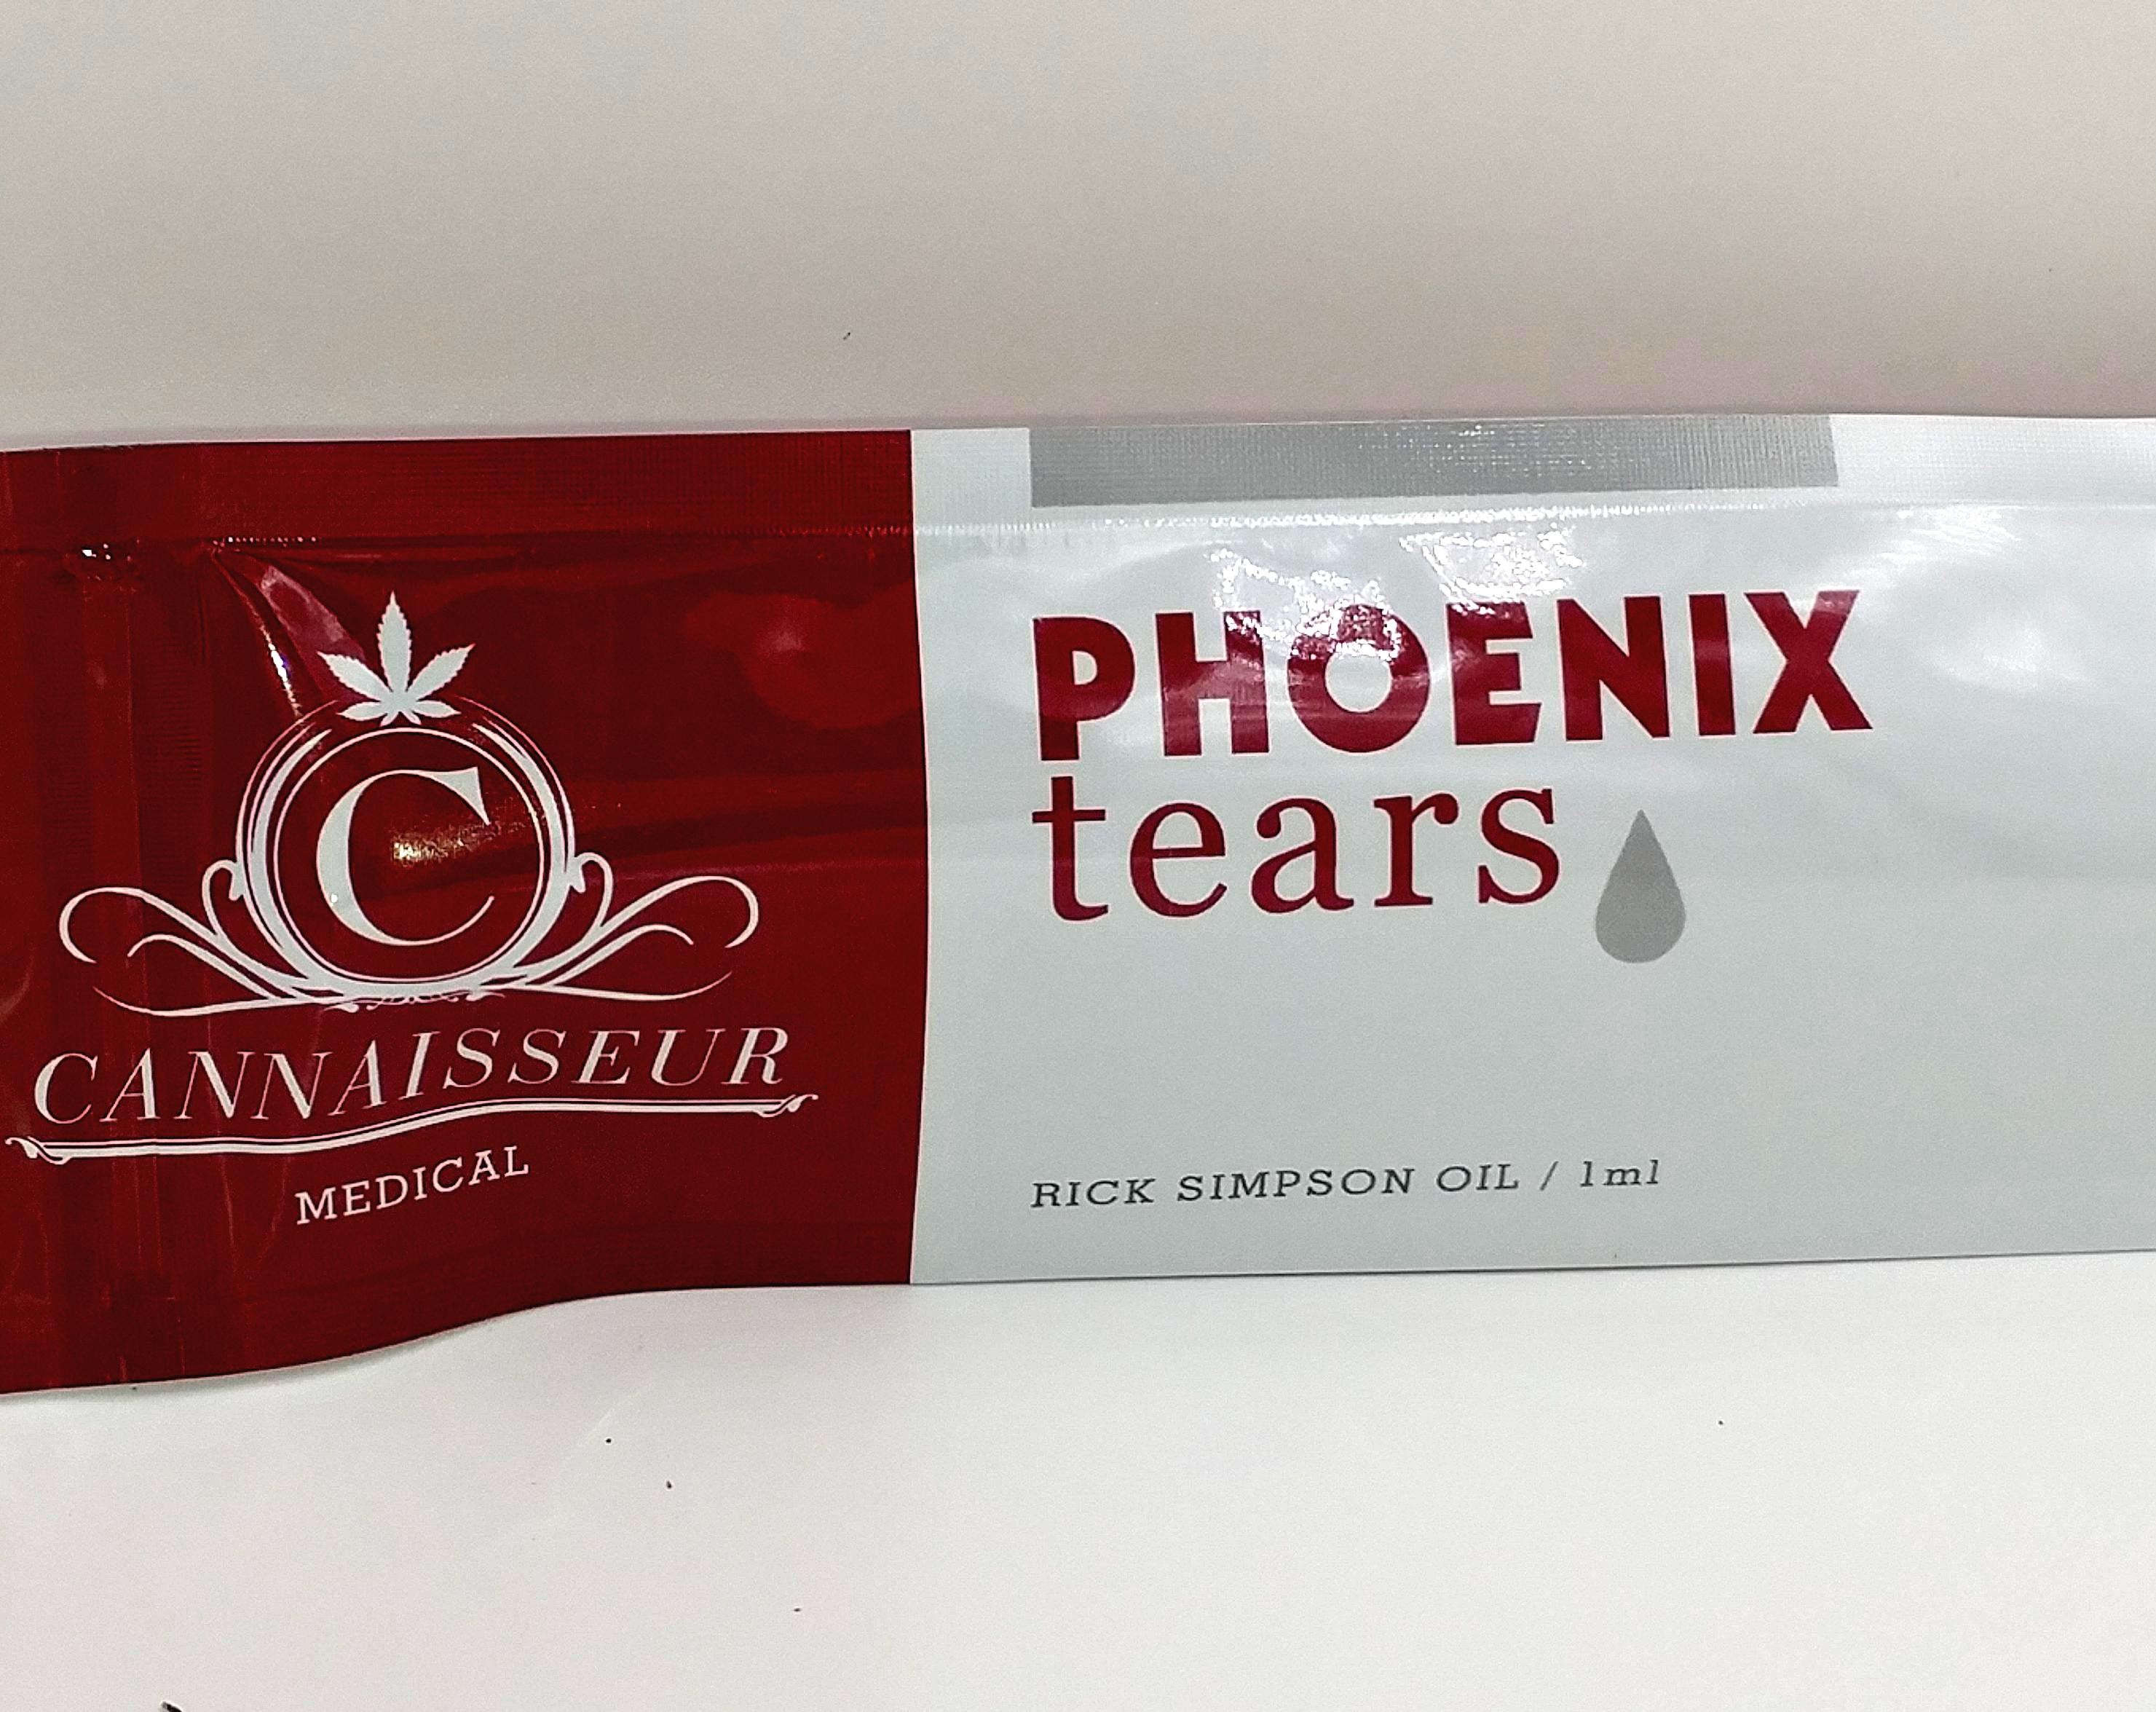 canna phoenix tears e1509593449512 boost ye2ekh